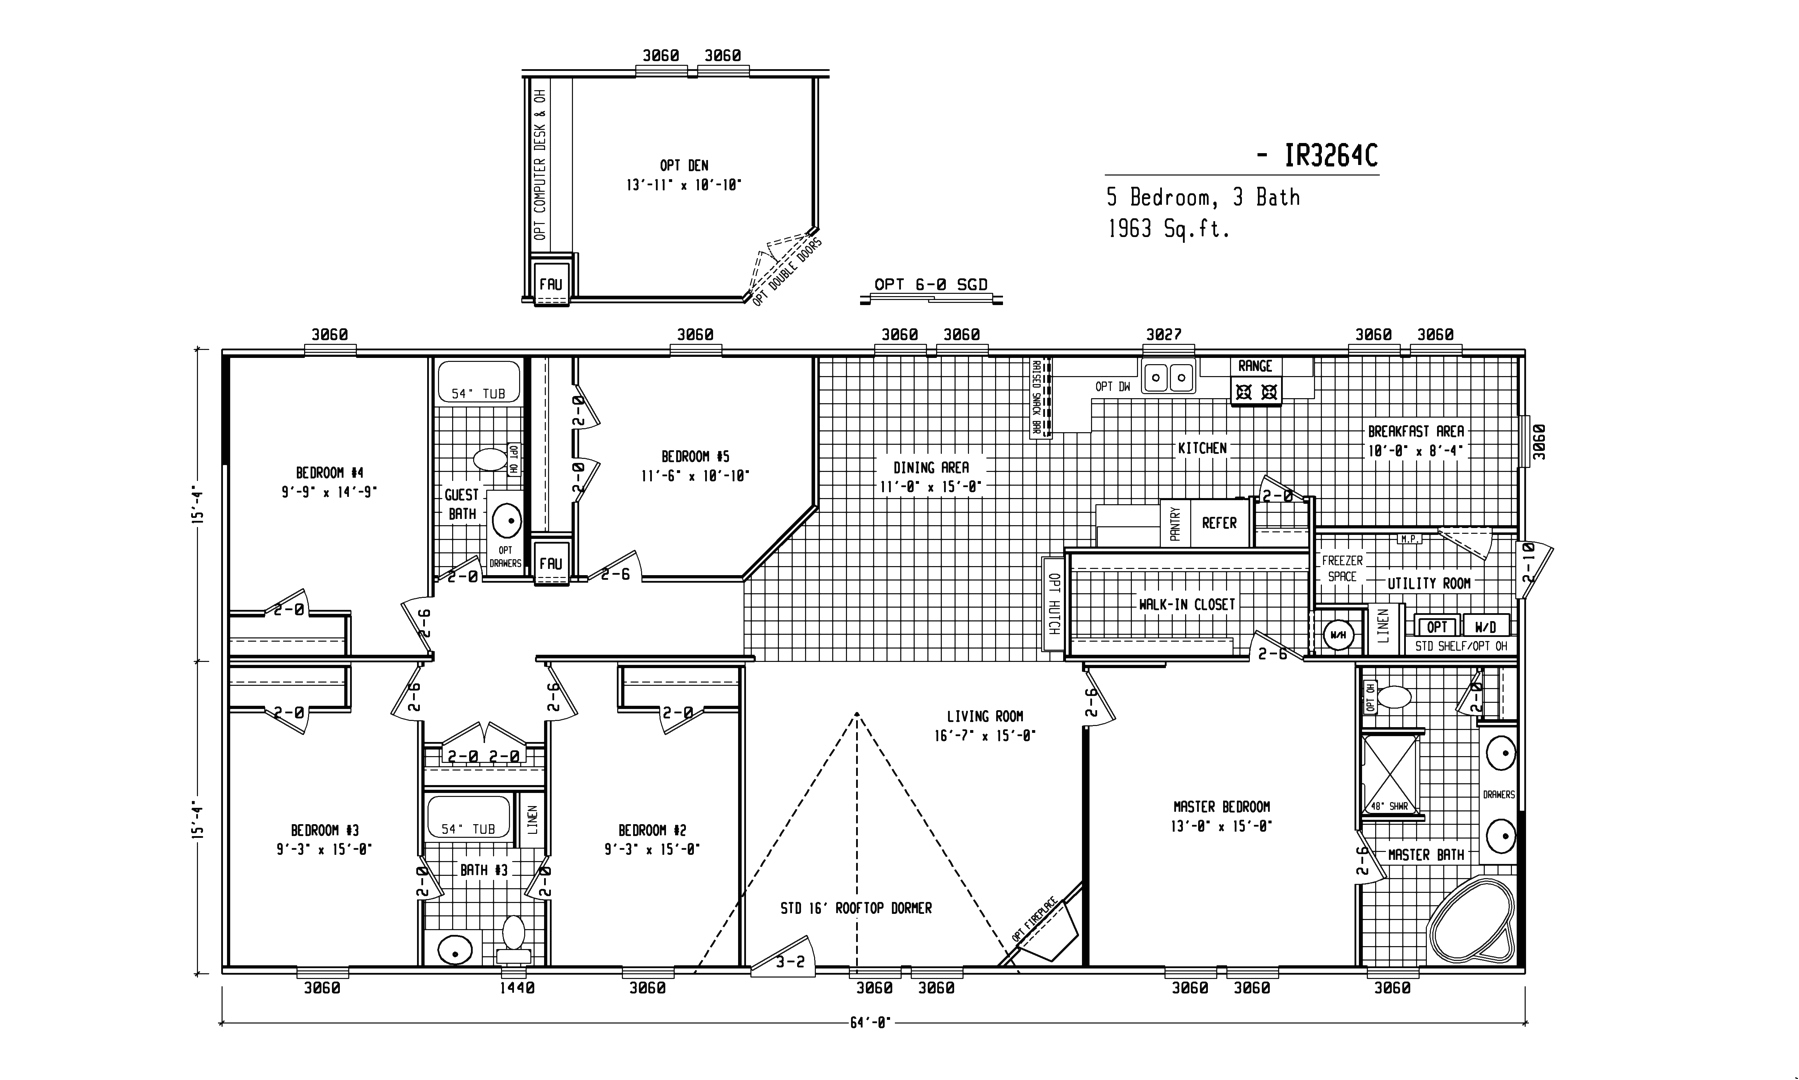 1997 fleetwood mobile home floor plan fuqua homes floor plans fresh manufactured home floor plans fresh